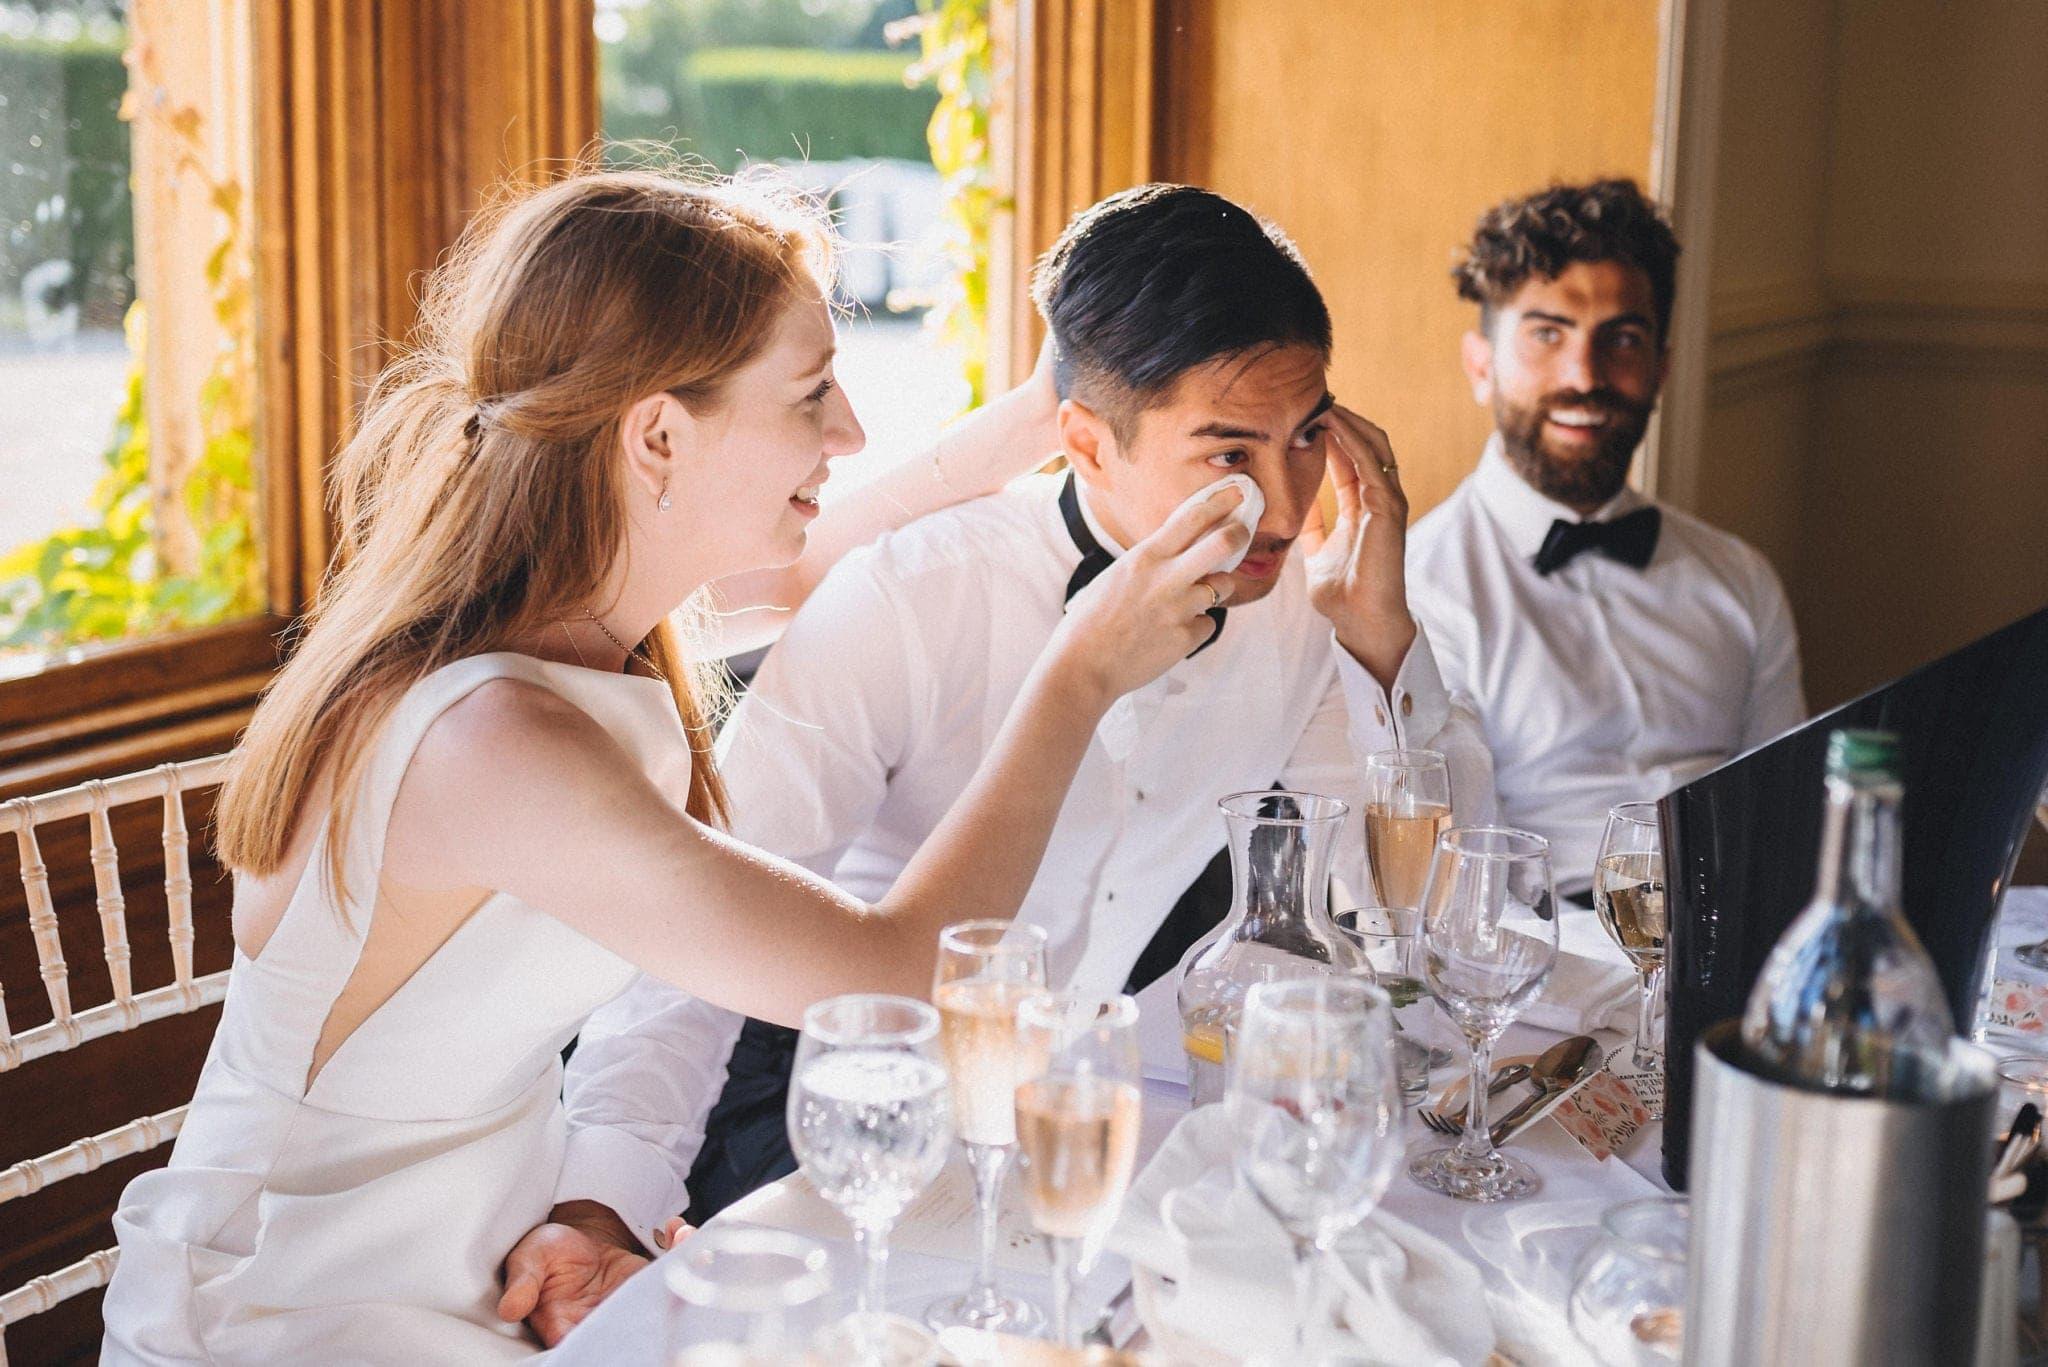 Bride wipes groom's eyes during emotional wedding speeches